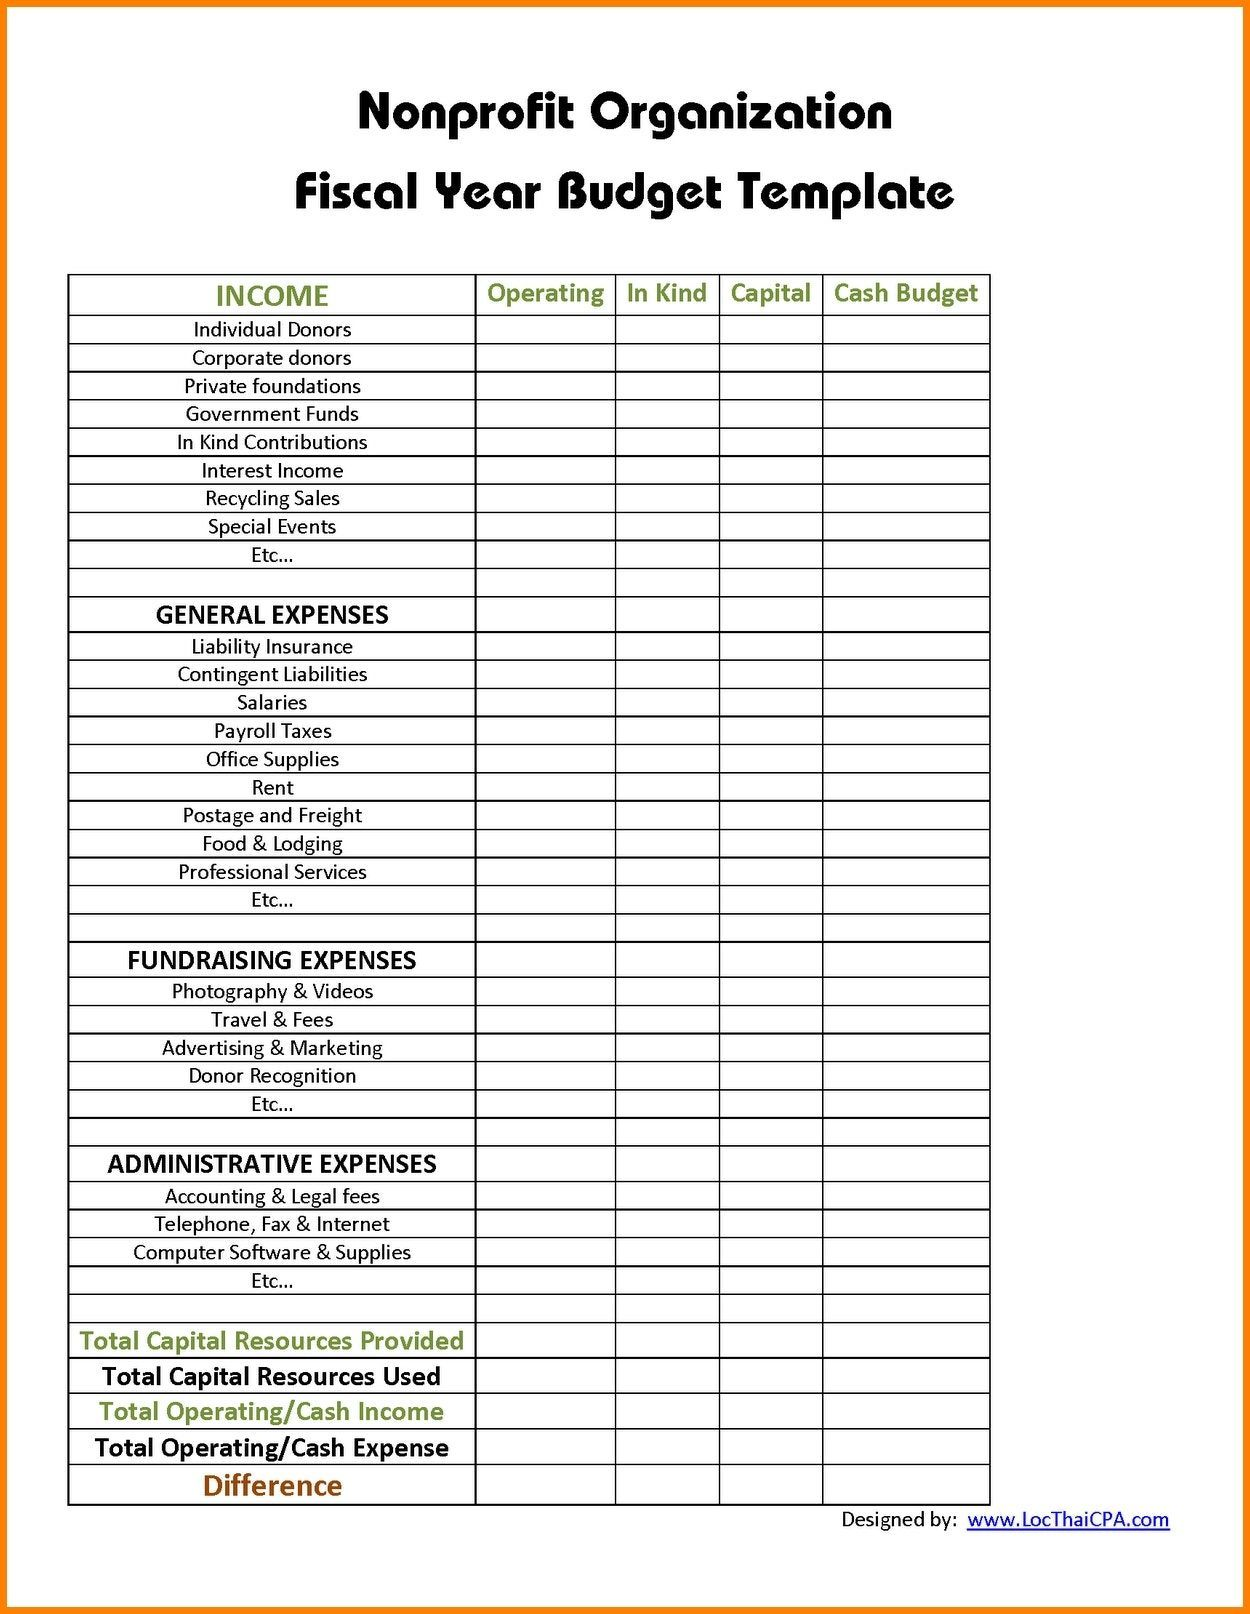 Non Profit Organization Balance Sheet Example